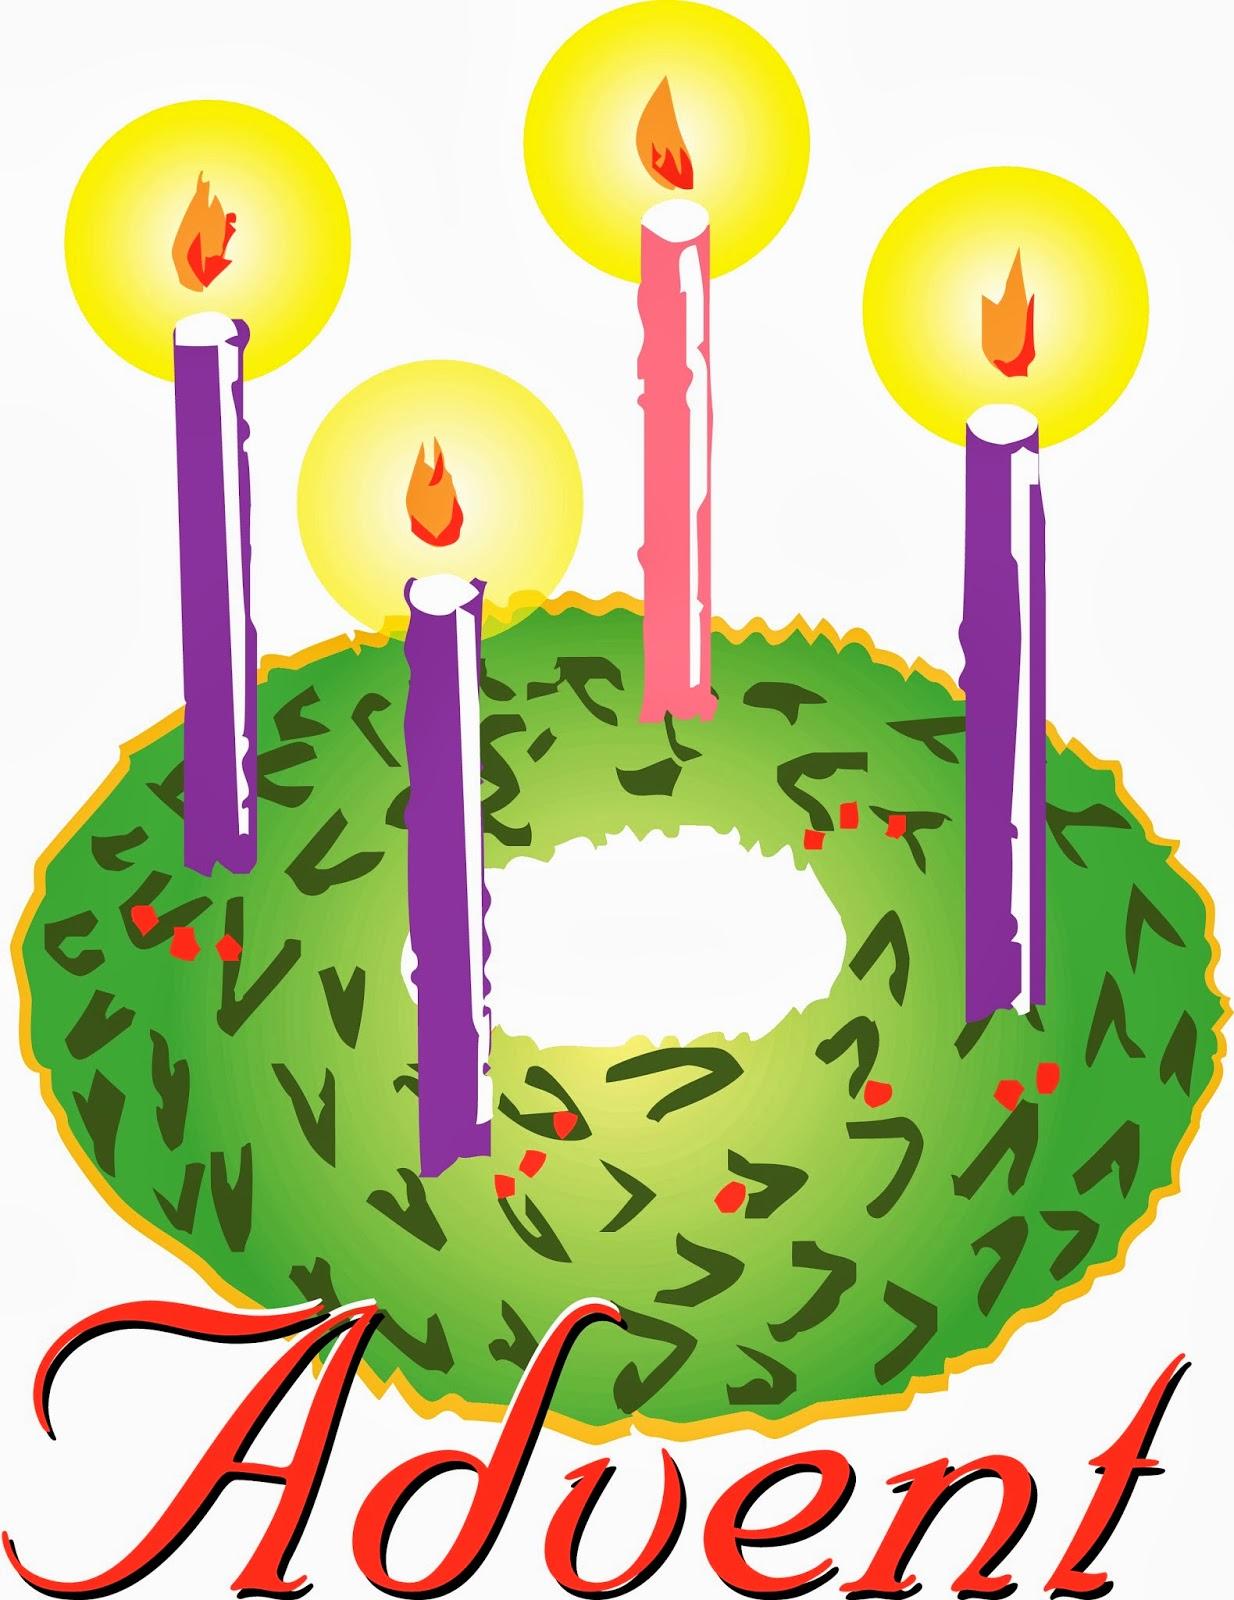 1234x1600 Advent Wreath Clipart Free 101 Clip Art